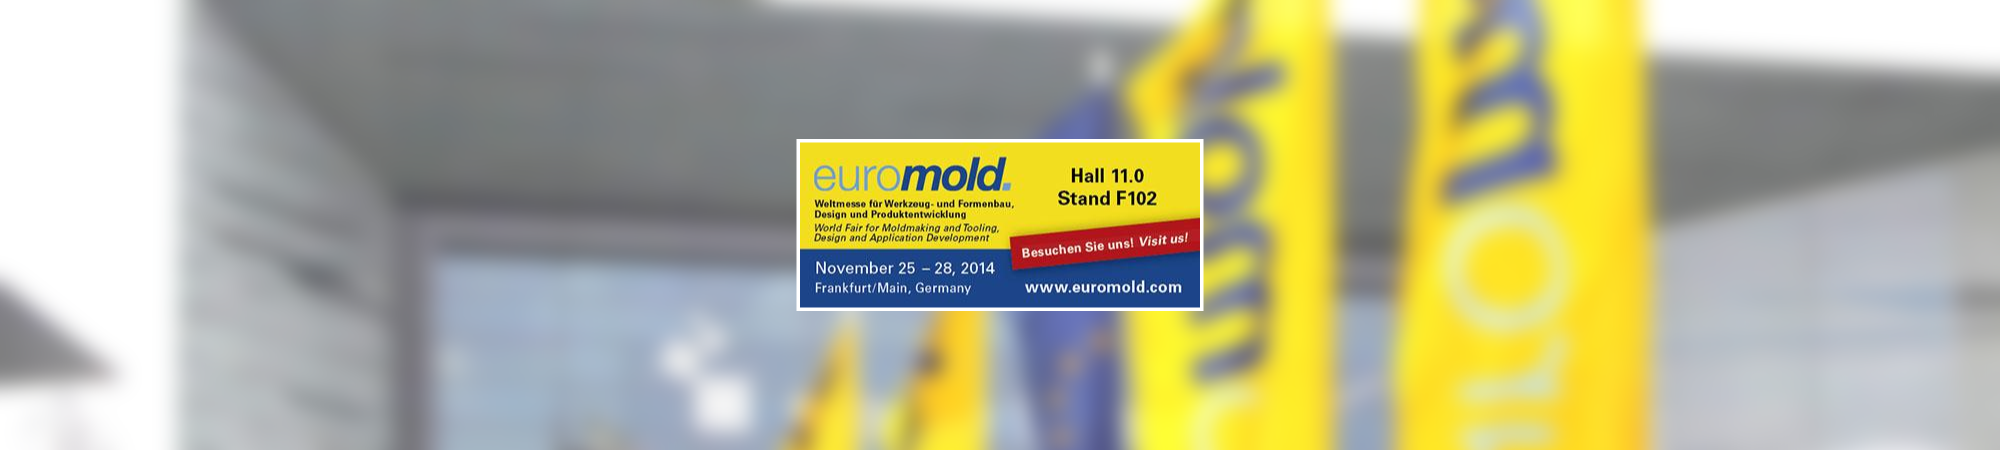 slider_euromold14